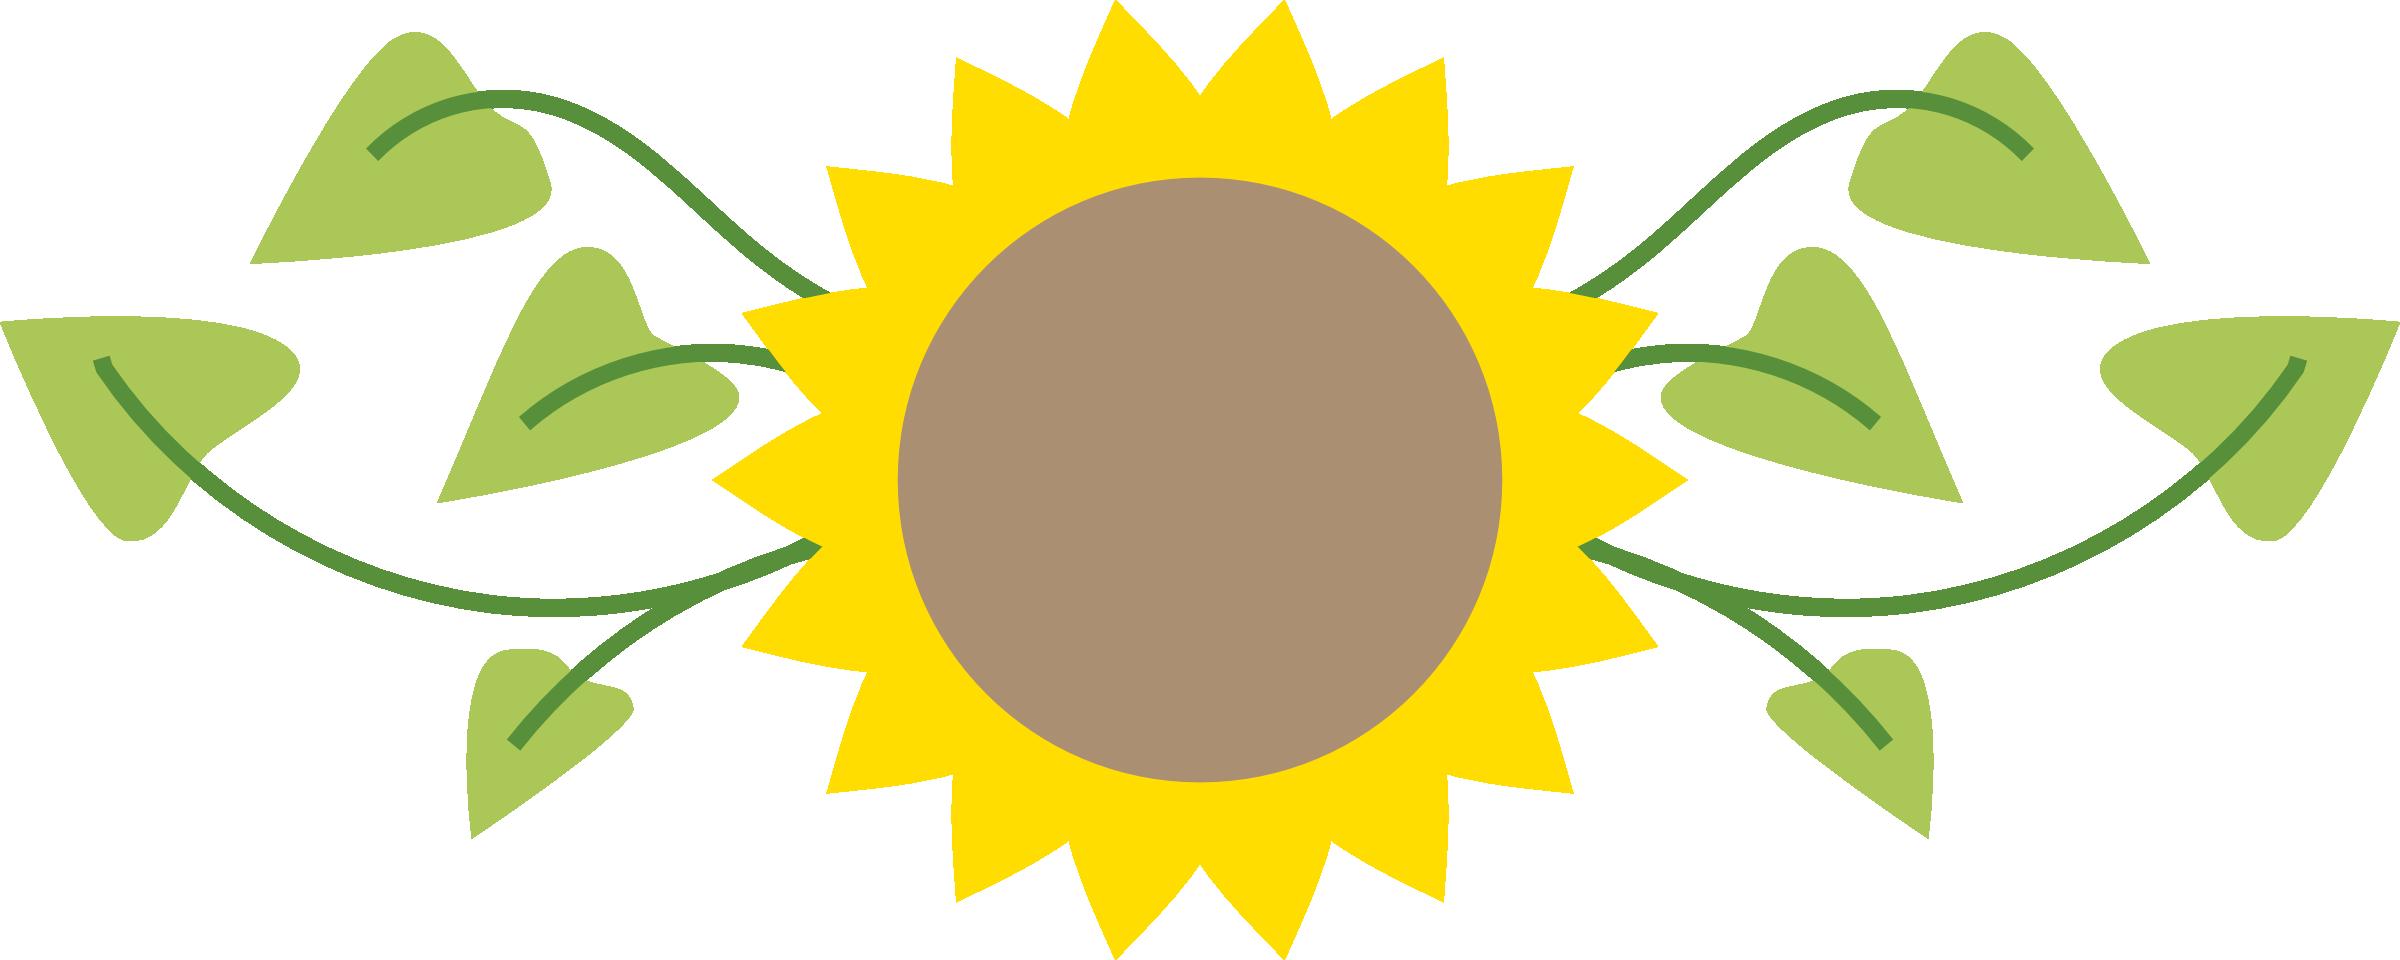 2400x960 Sunflower Border Clipart